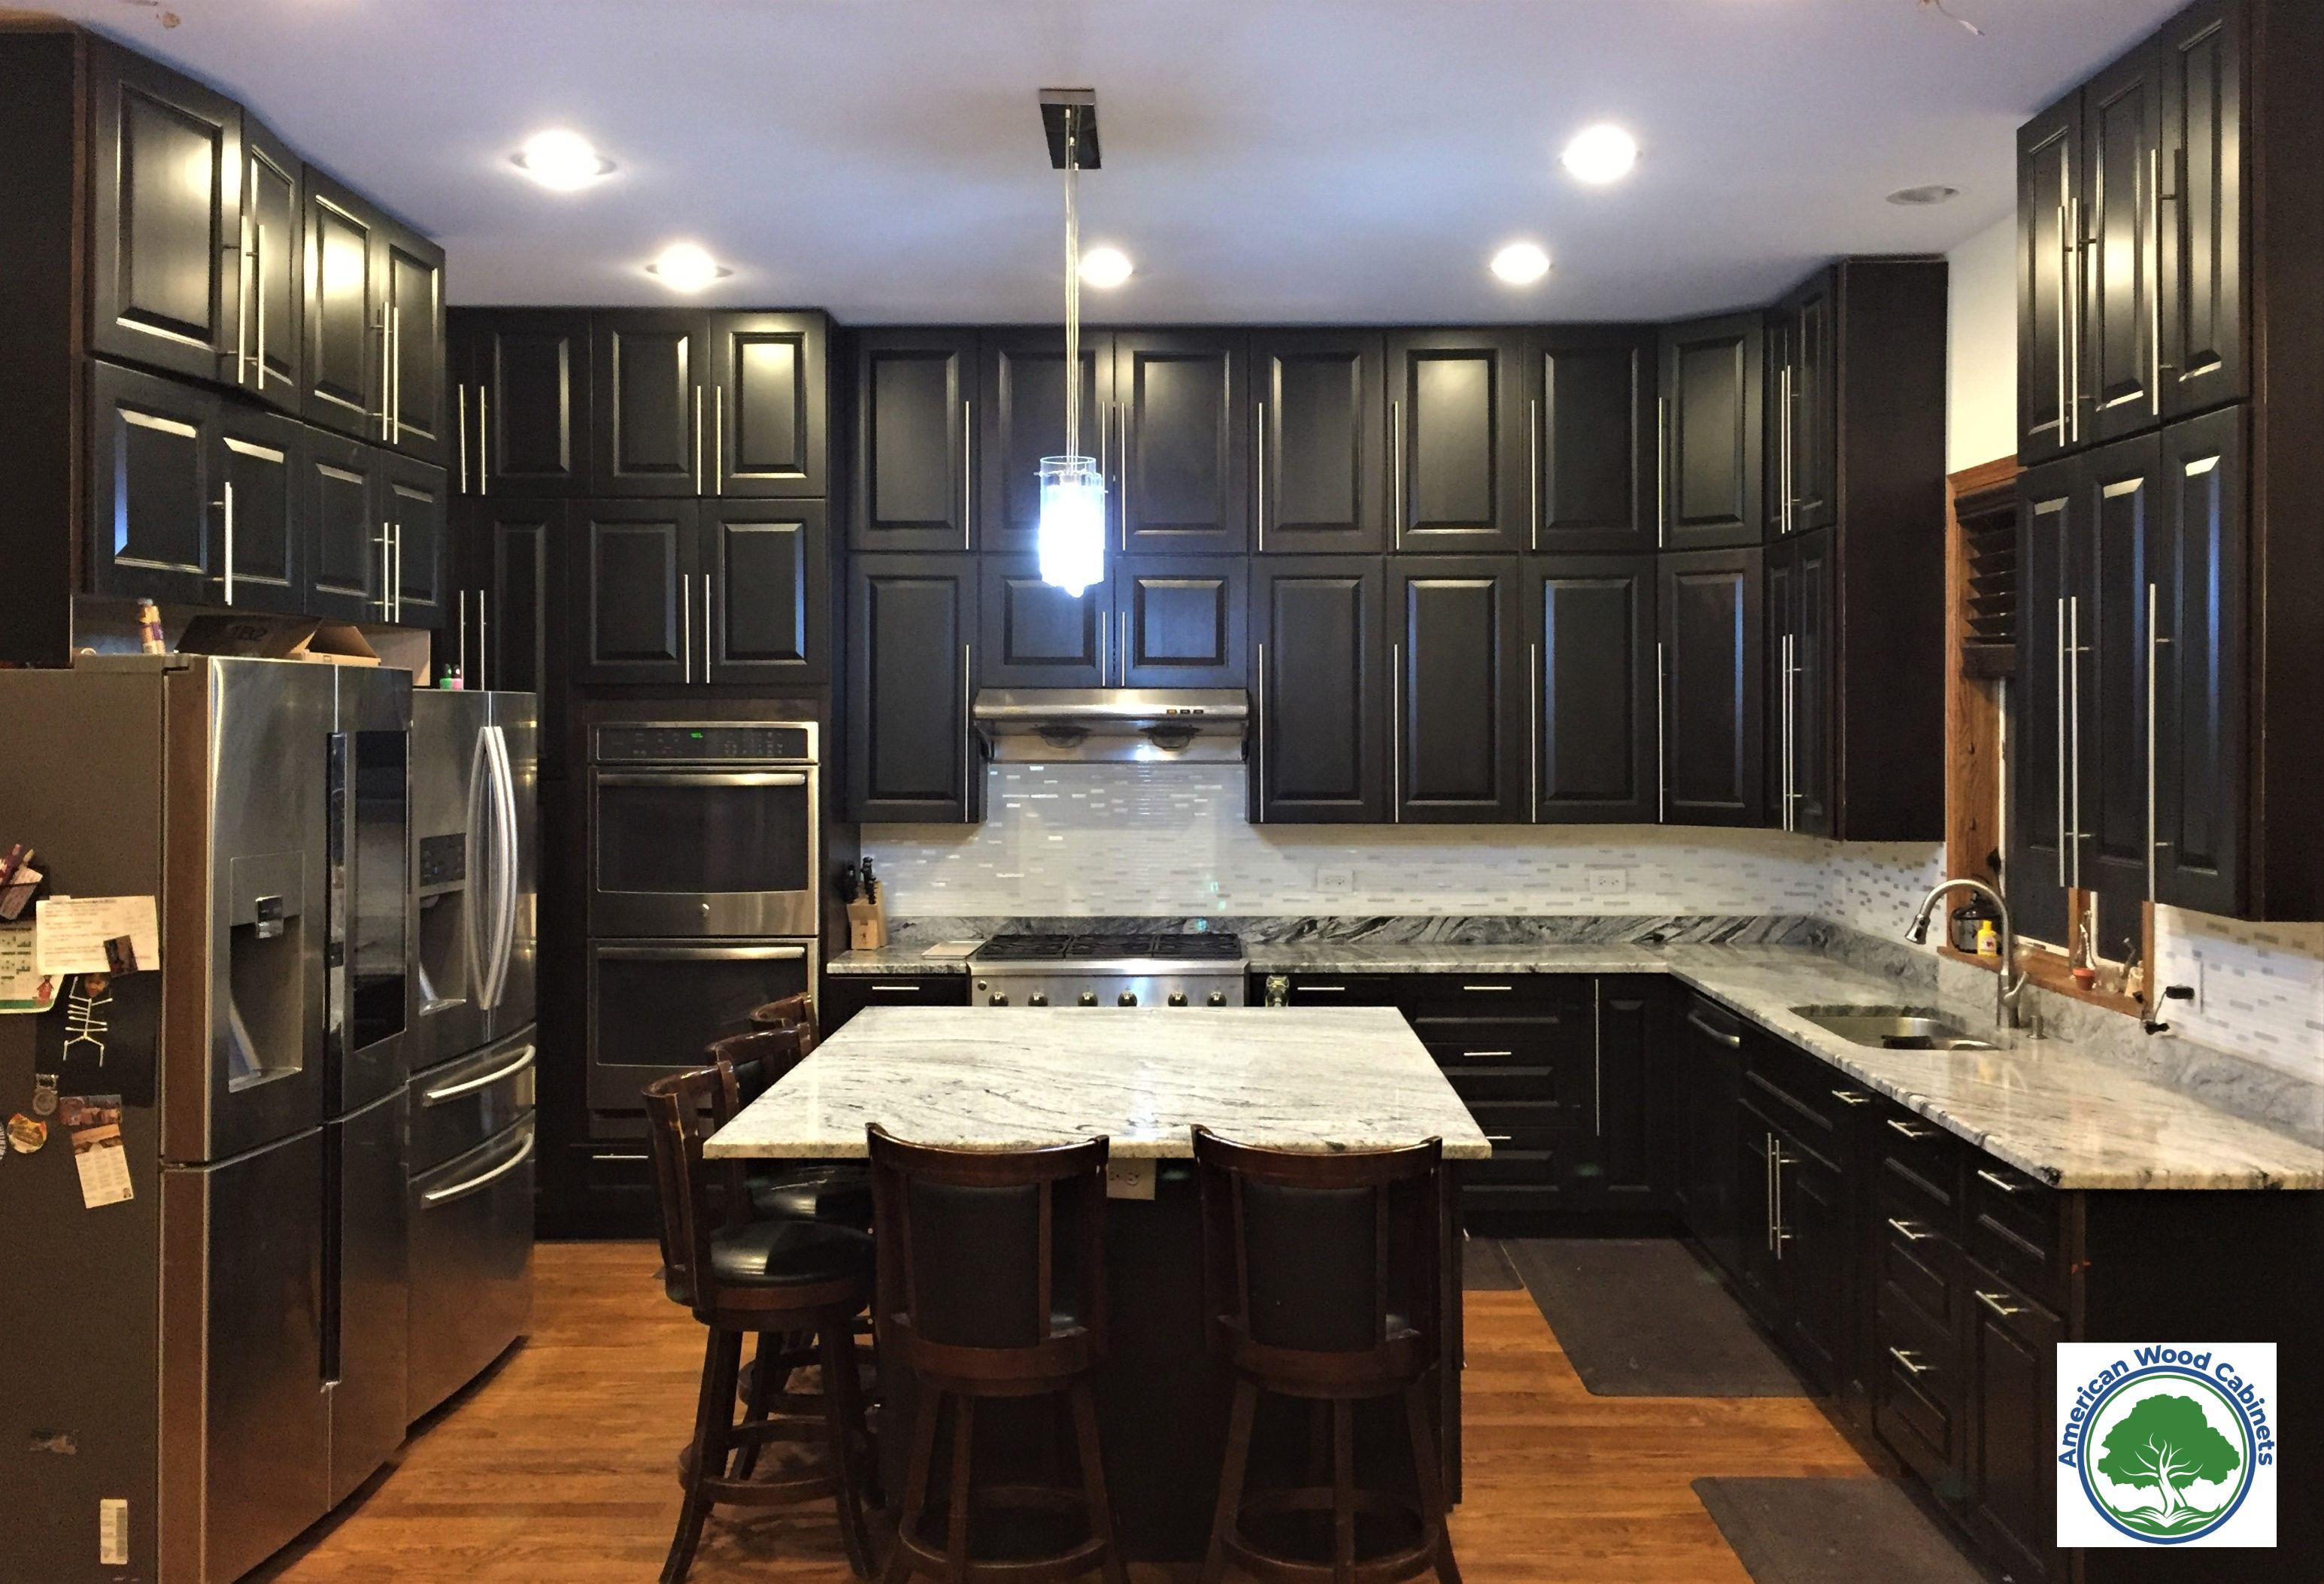 Raised Panel Espresso Kitchen Cabinets Kitchen Cleaning Hacks Espresso Kitchen Cabinets Kitchen Cabinets And Granite